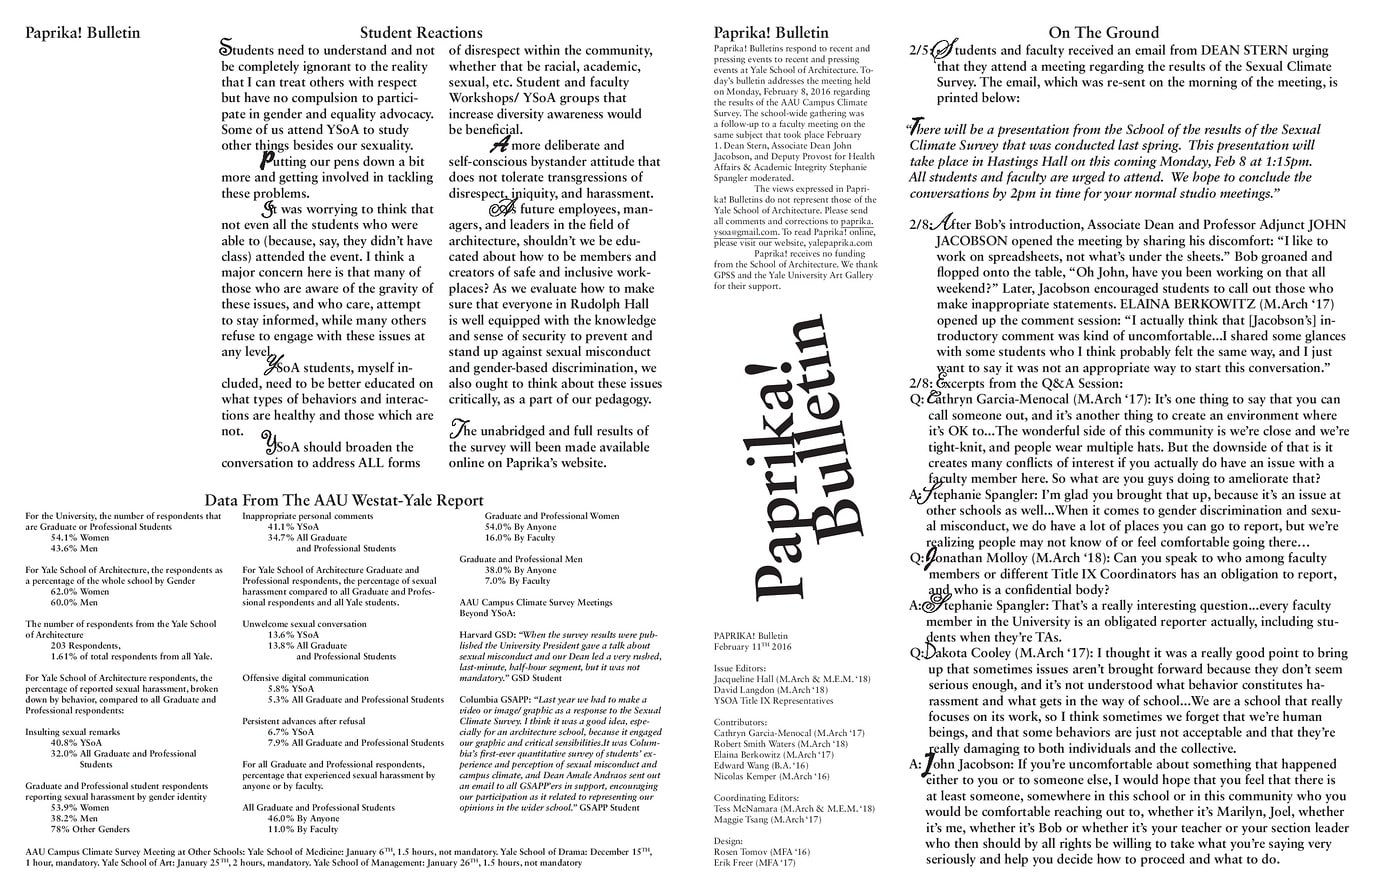 1-B AAU Westat-Yale Report